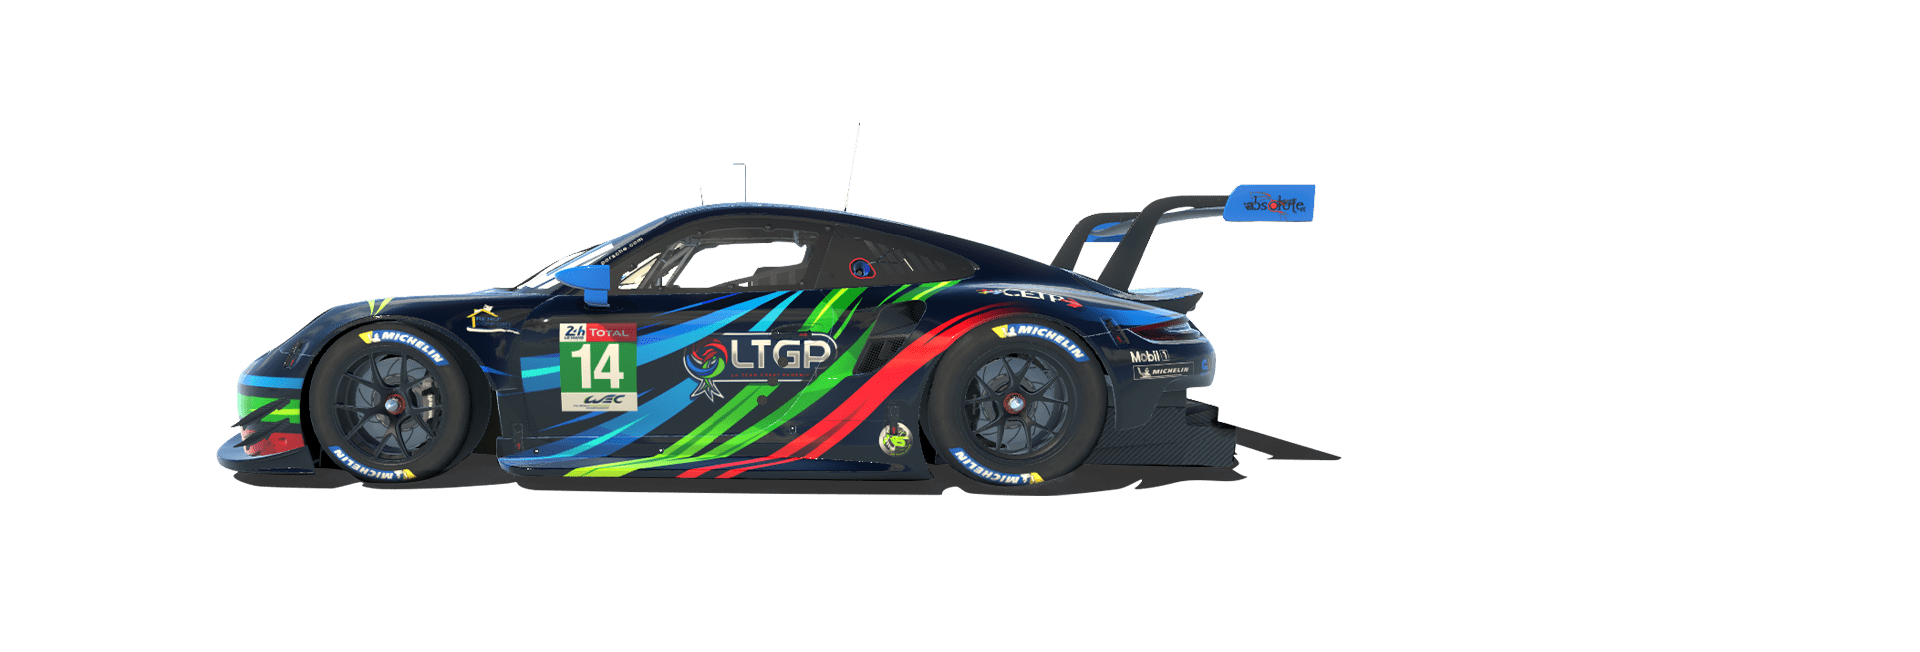 LTGP eSports Porsche